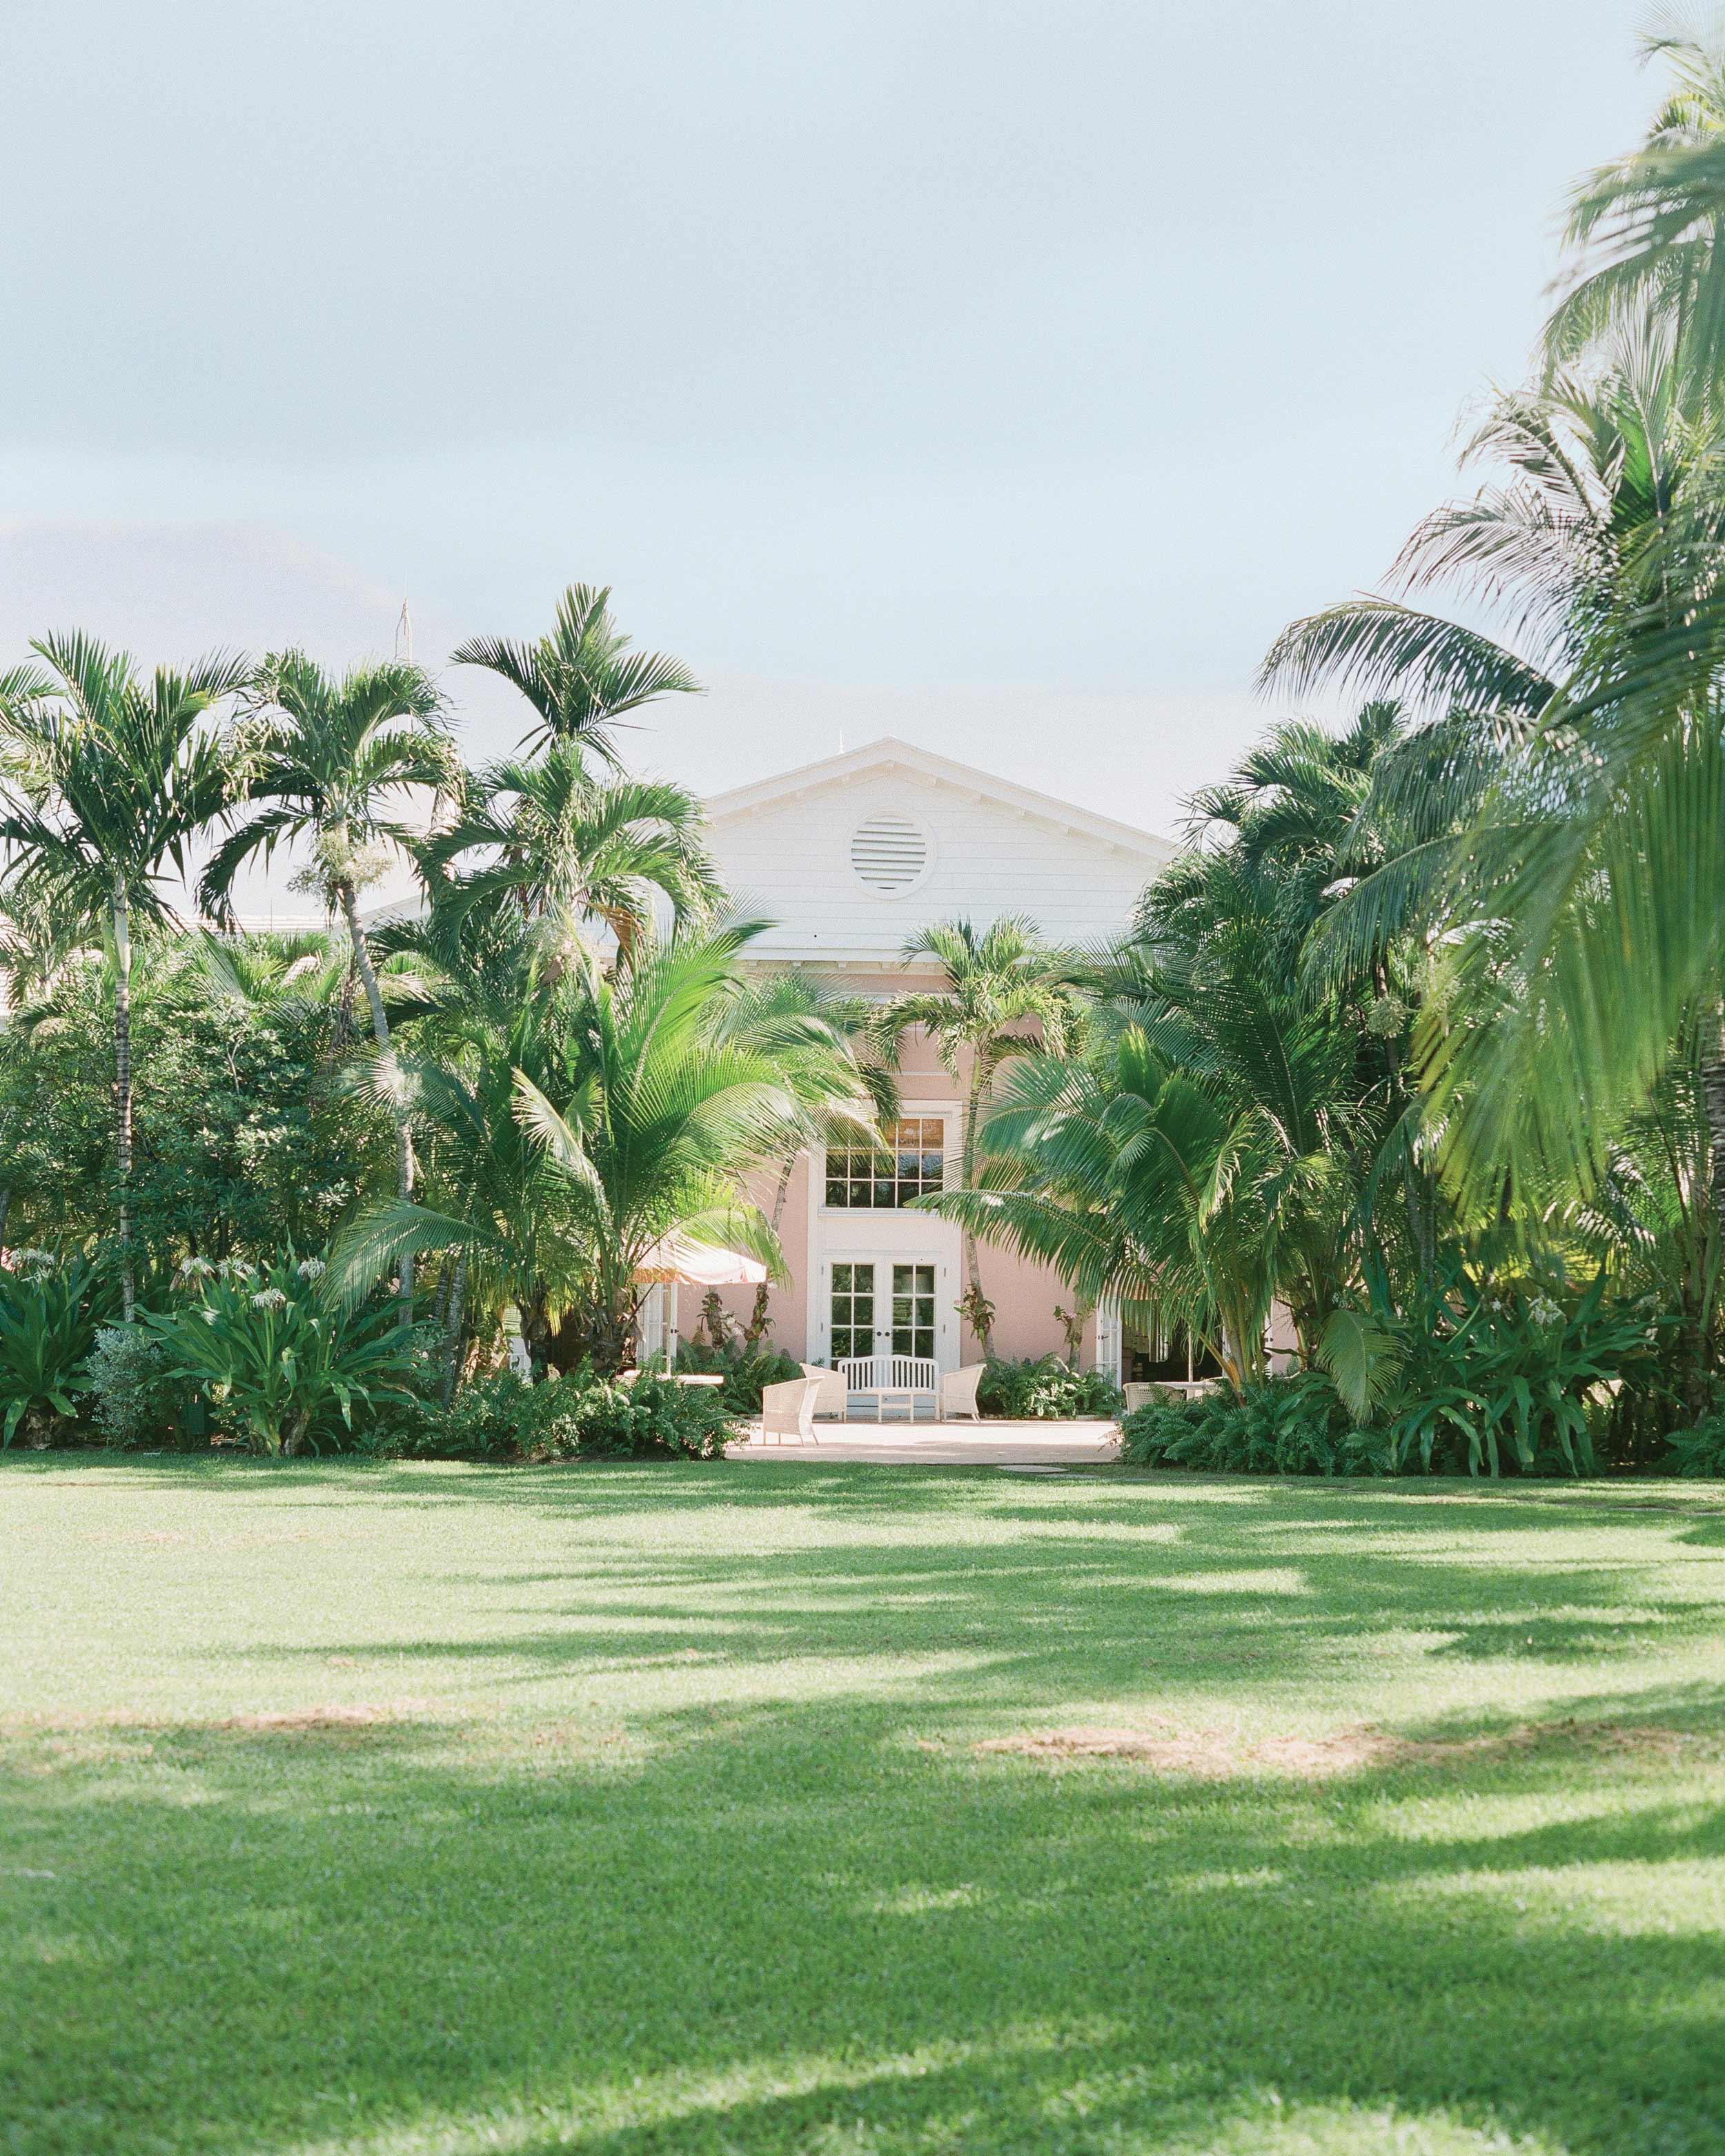 kelsey-casey-real-wedding-tropical-location.jpg